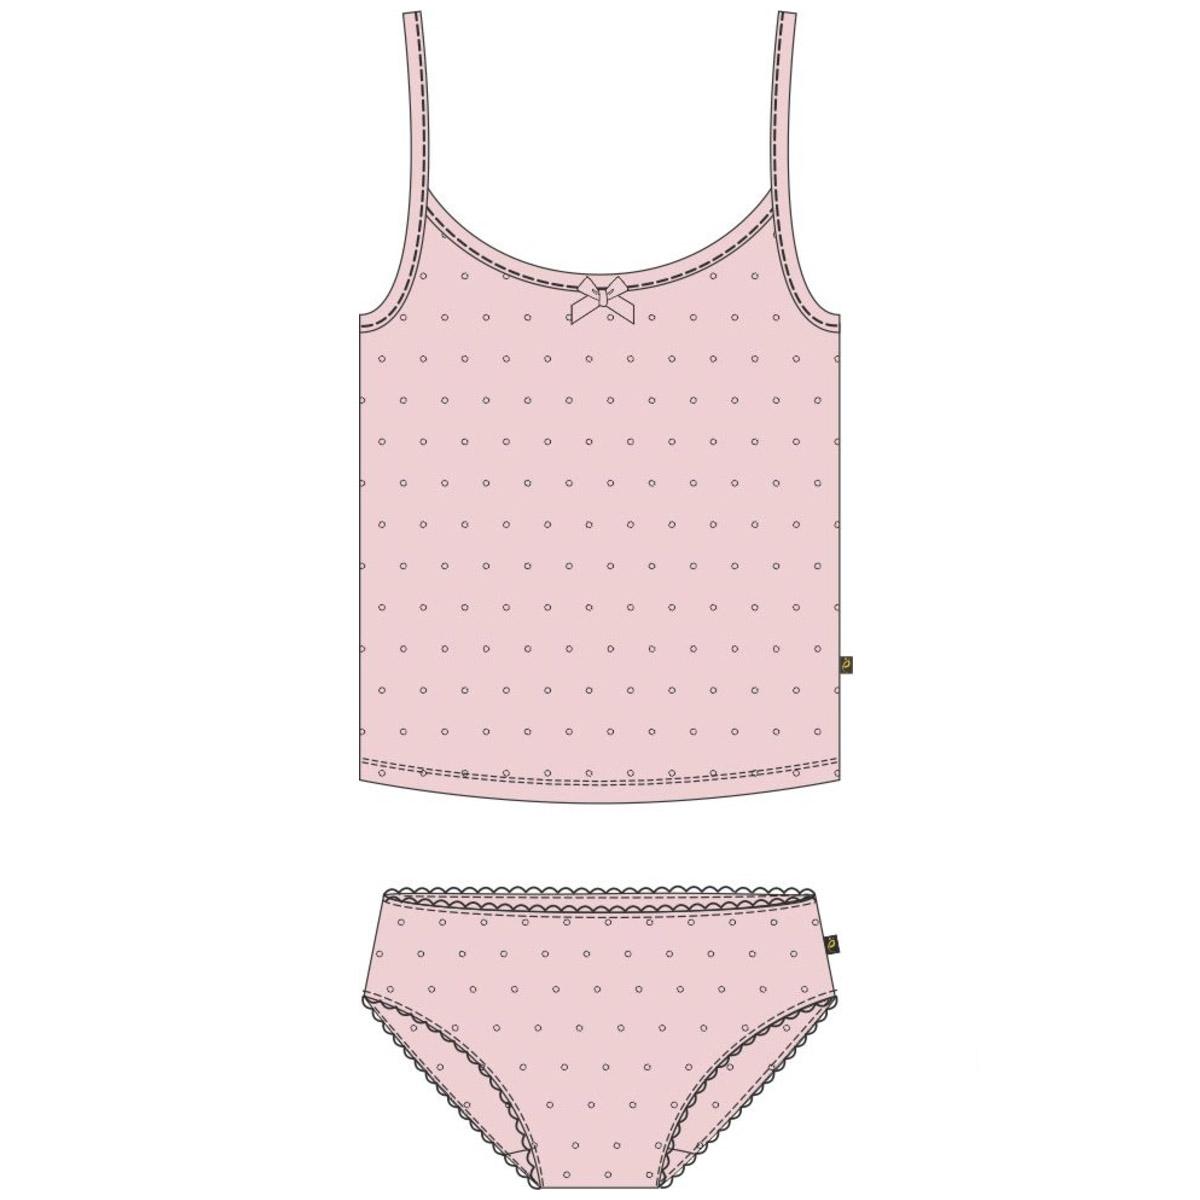 Комплект Ёмаё майка и трусы (33-101) рост 92 розовый<br>